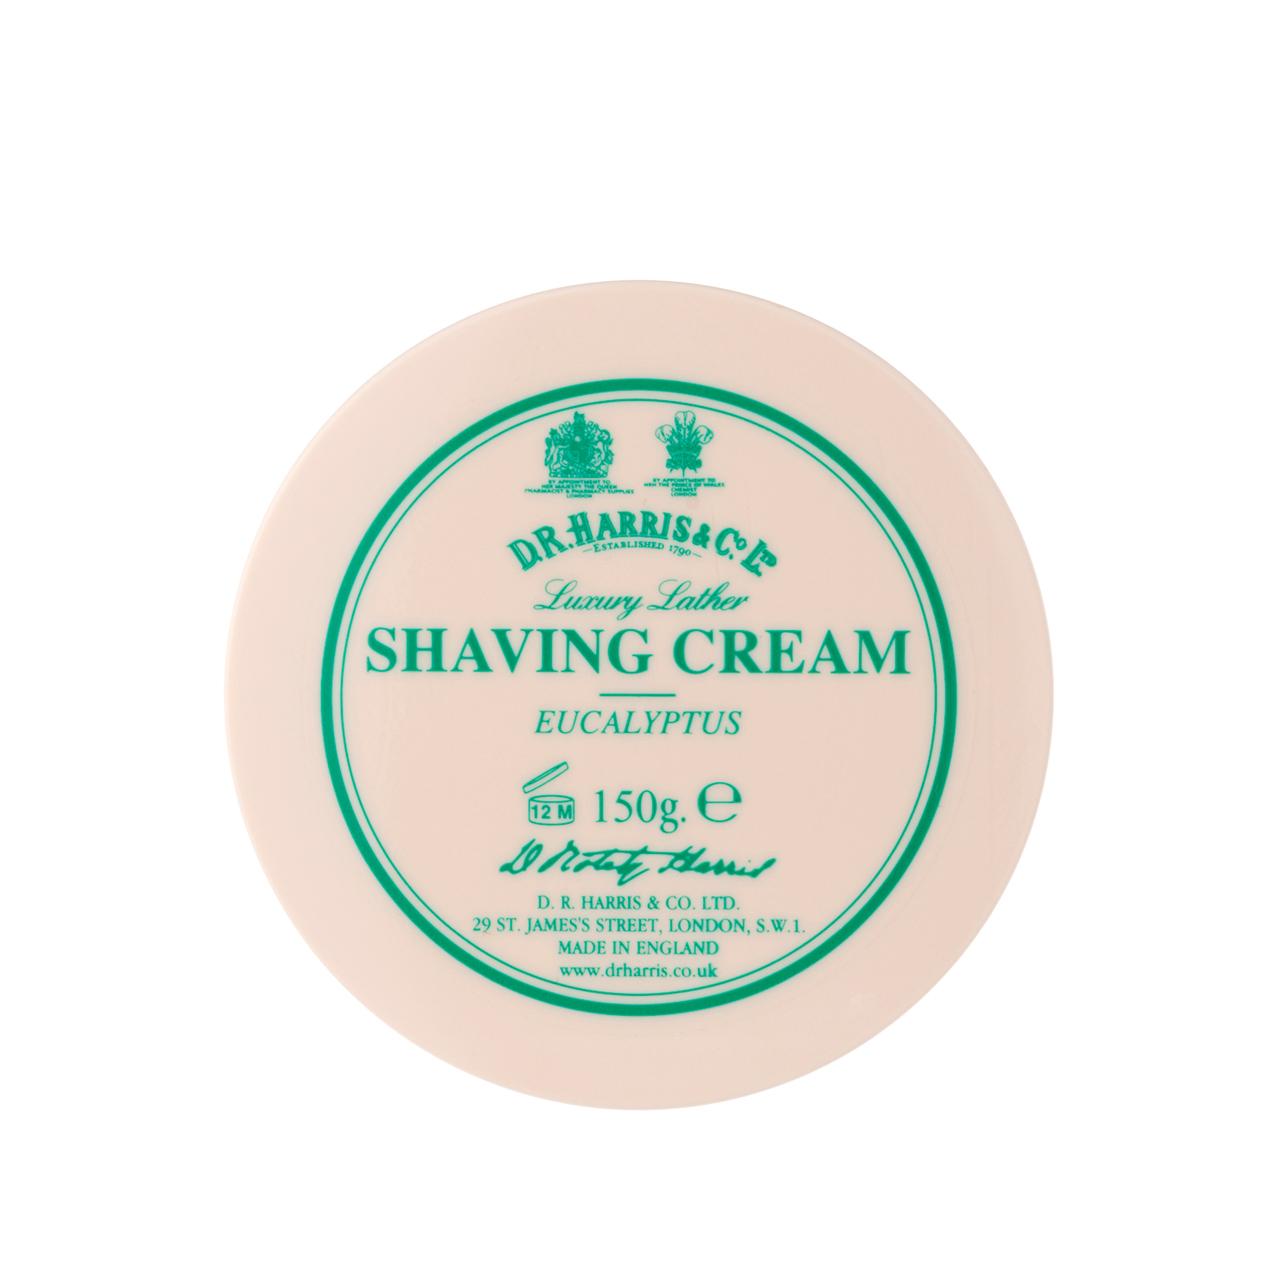 Eucalyptus - Shaving Cream Bowl